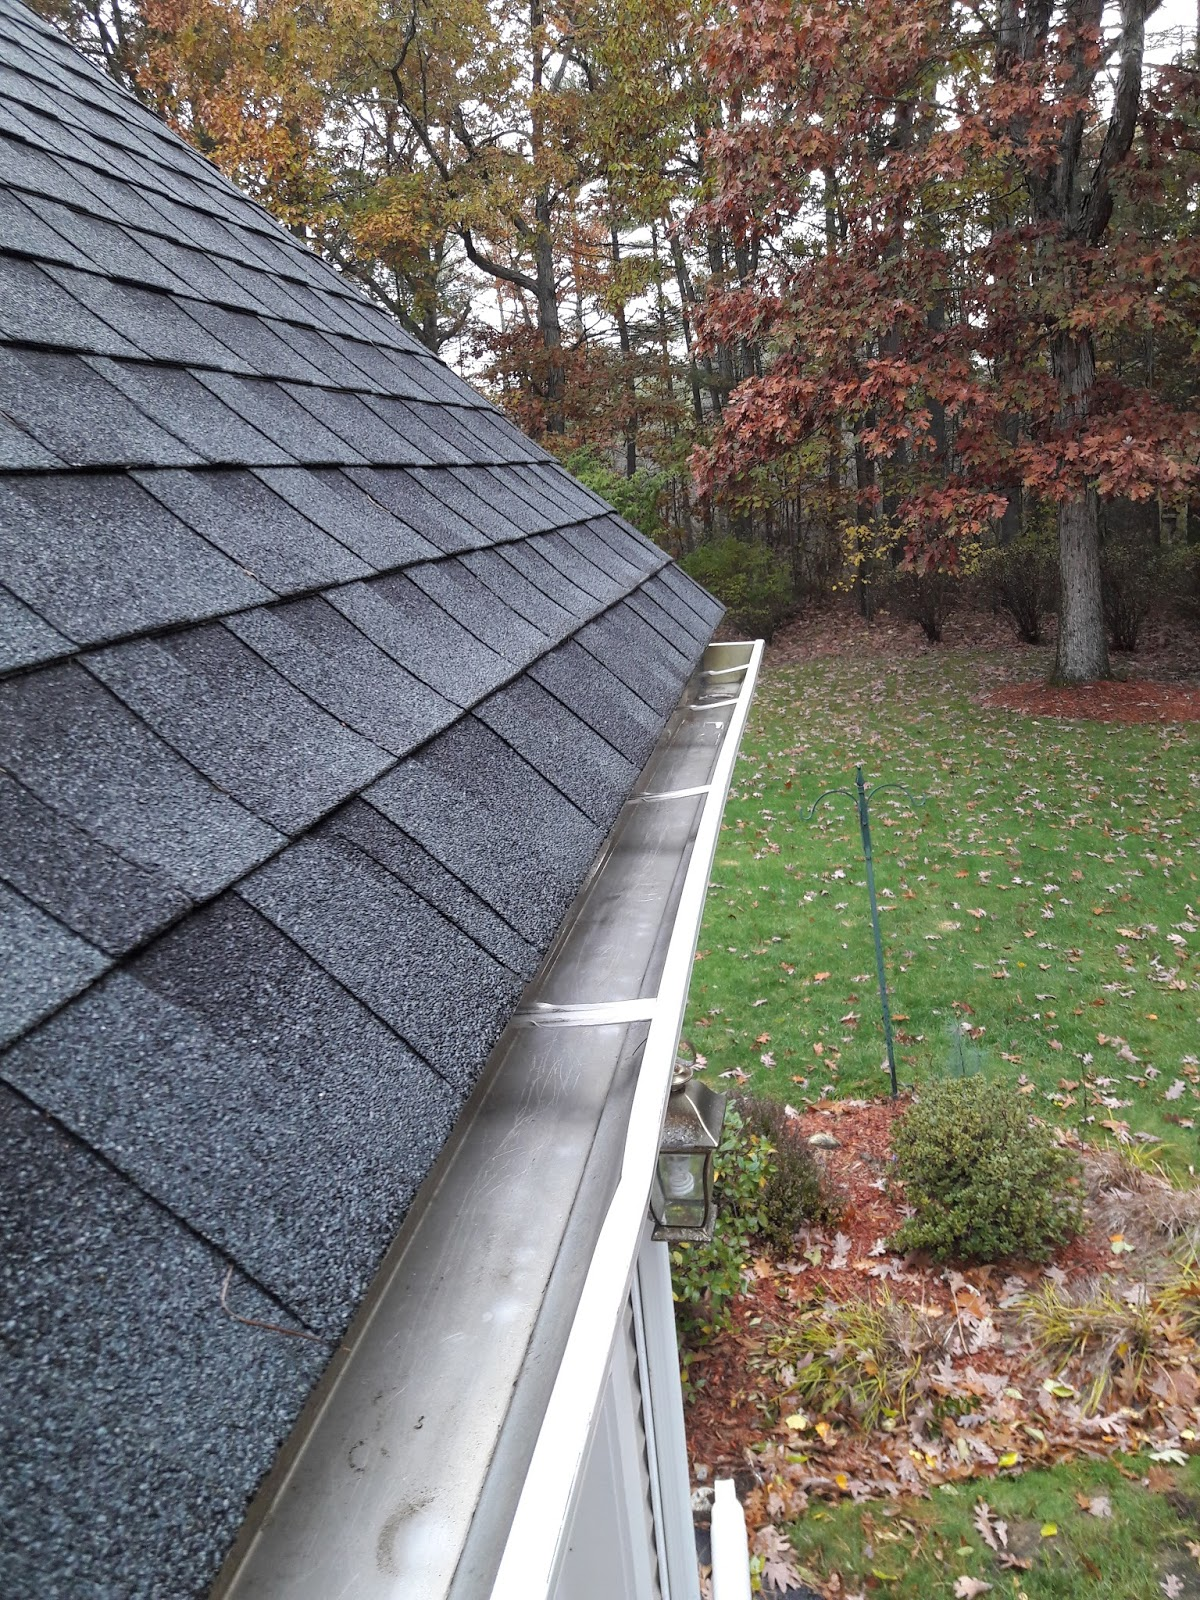 Nh Handyman Nh Exterior Home Repairs And Nh Gutter